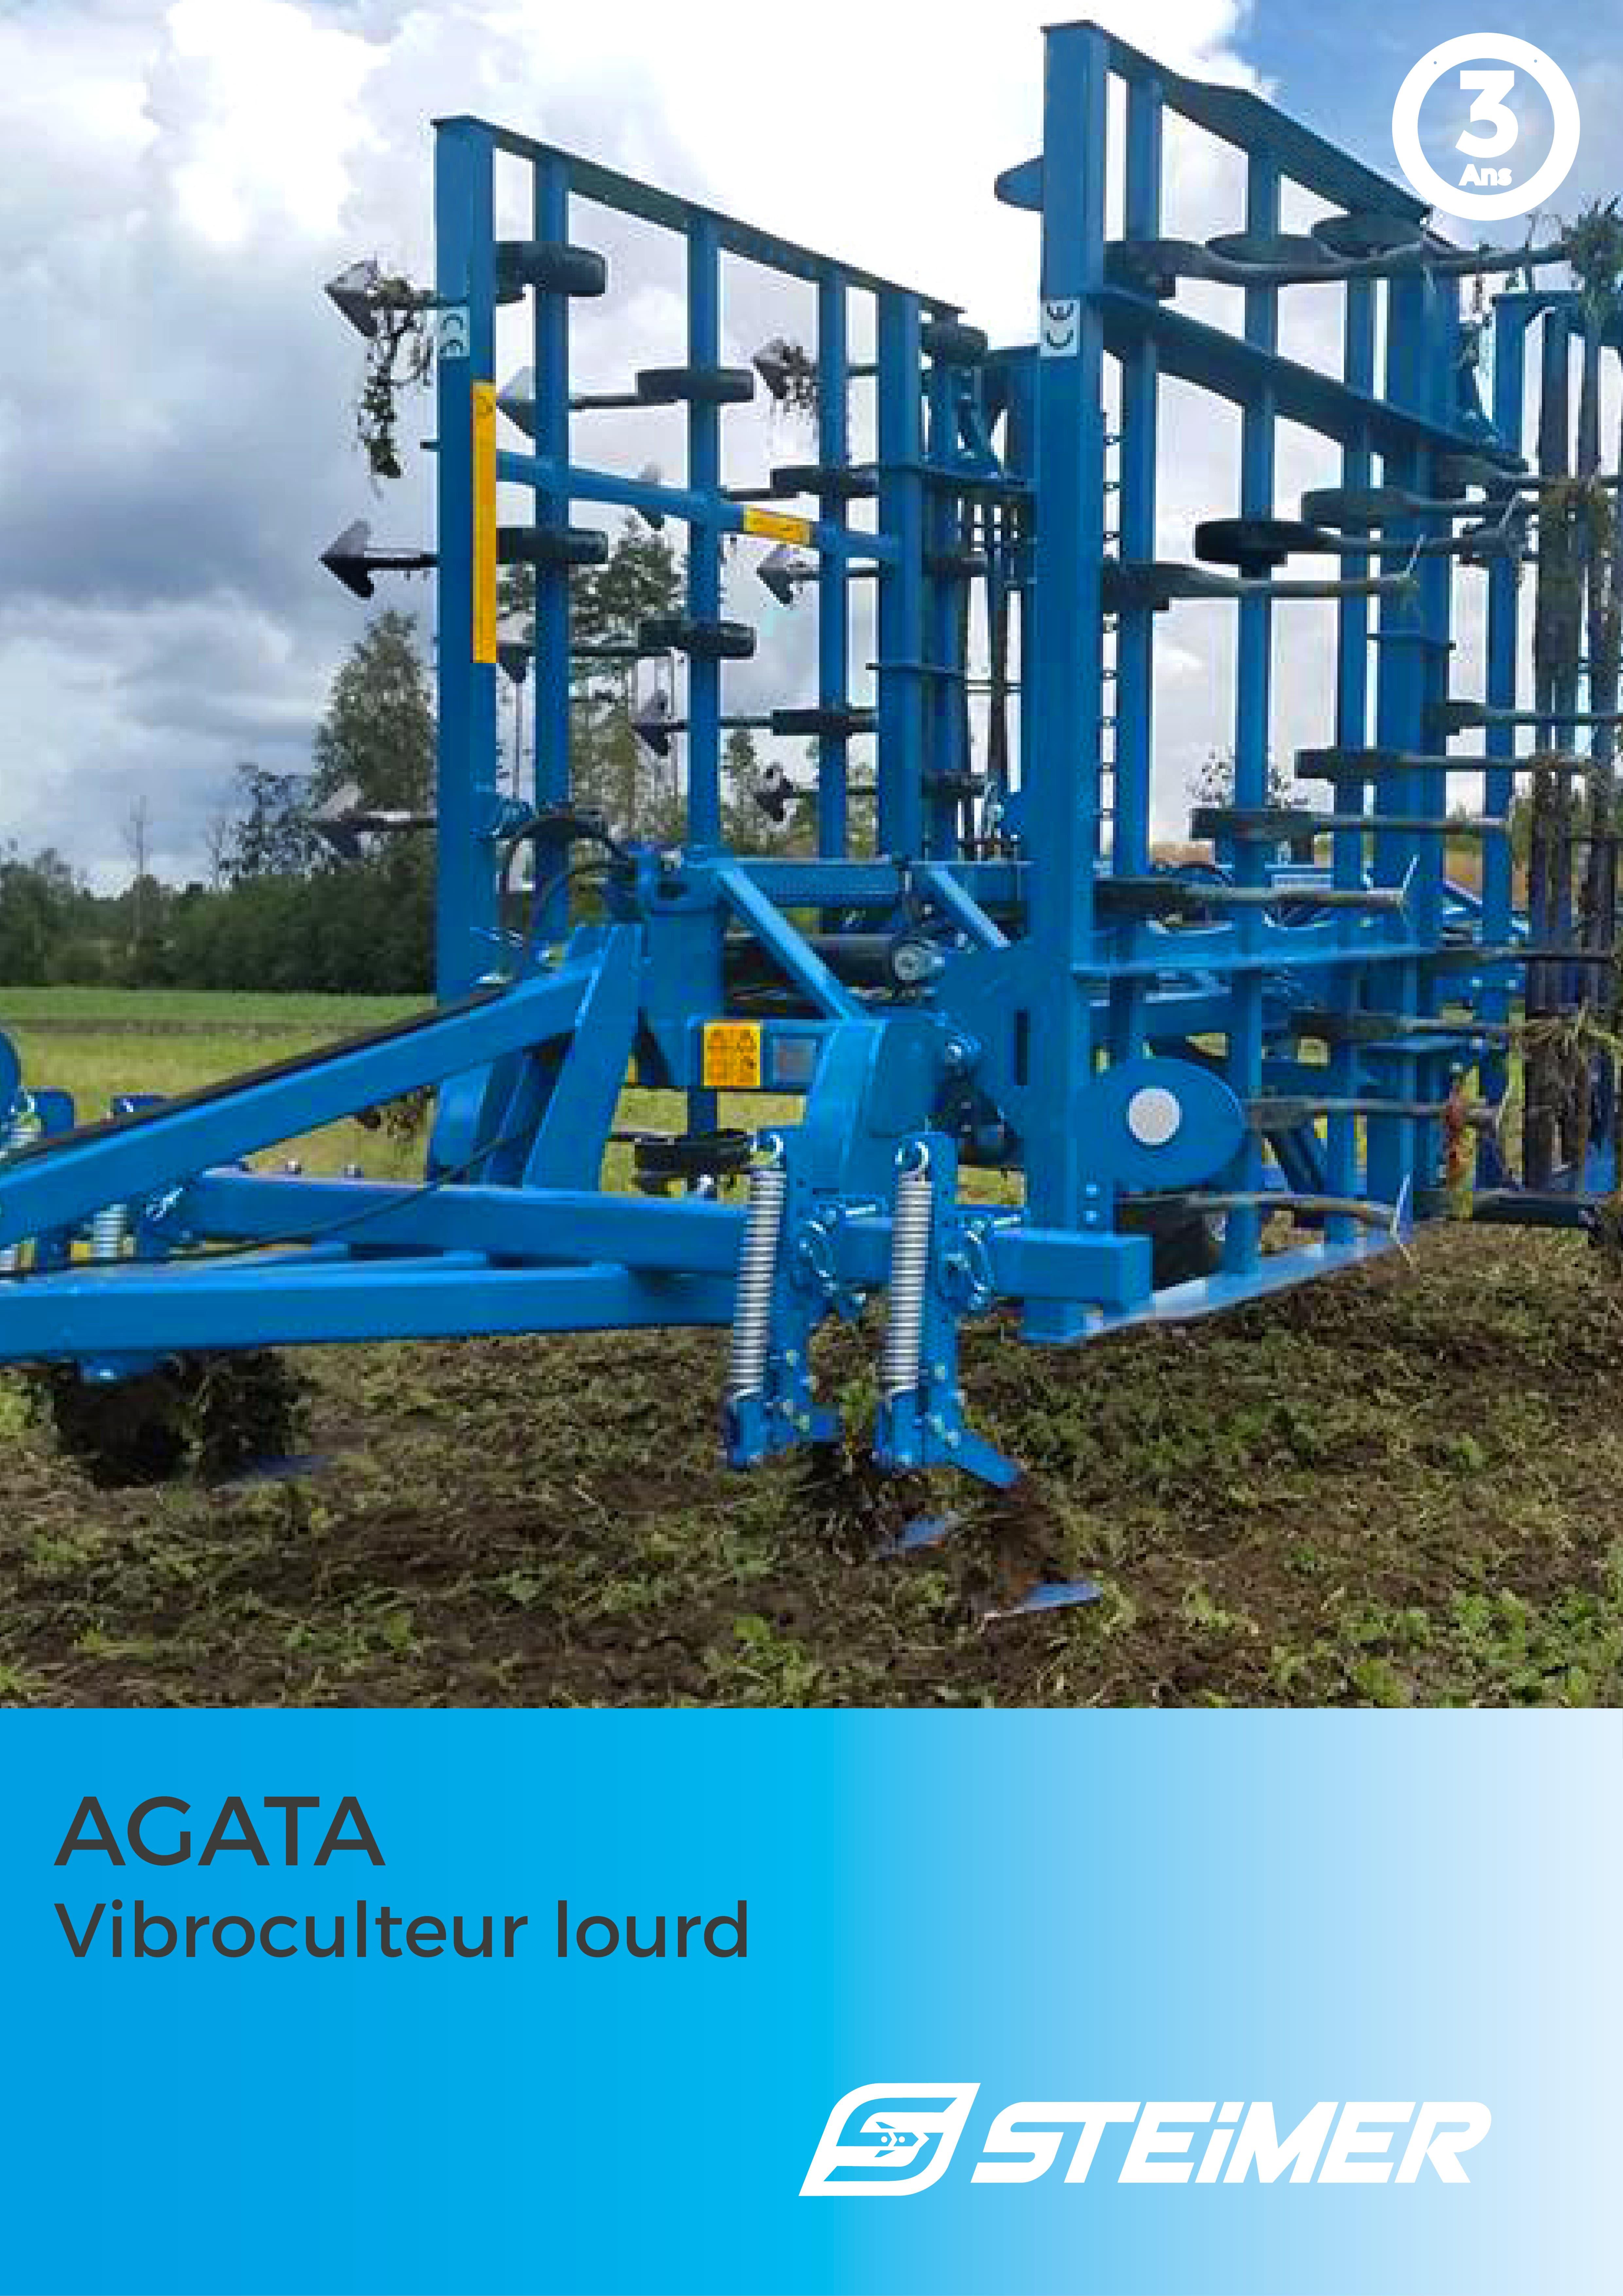 brochure Agata